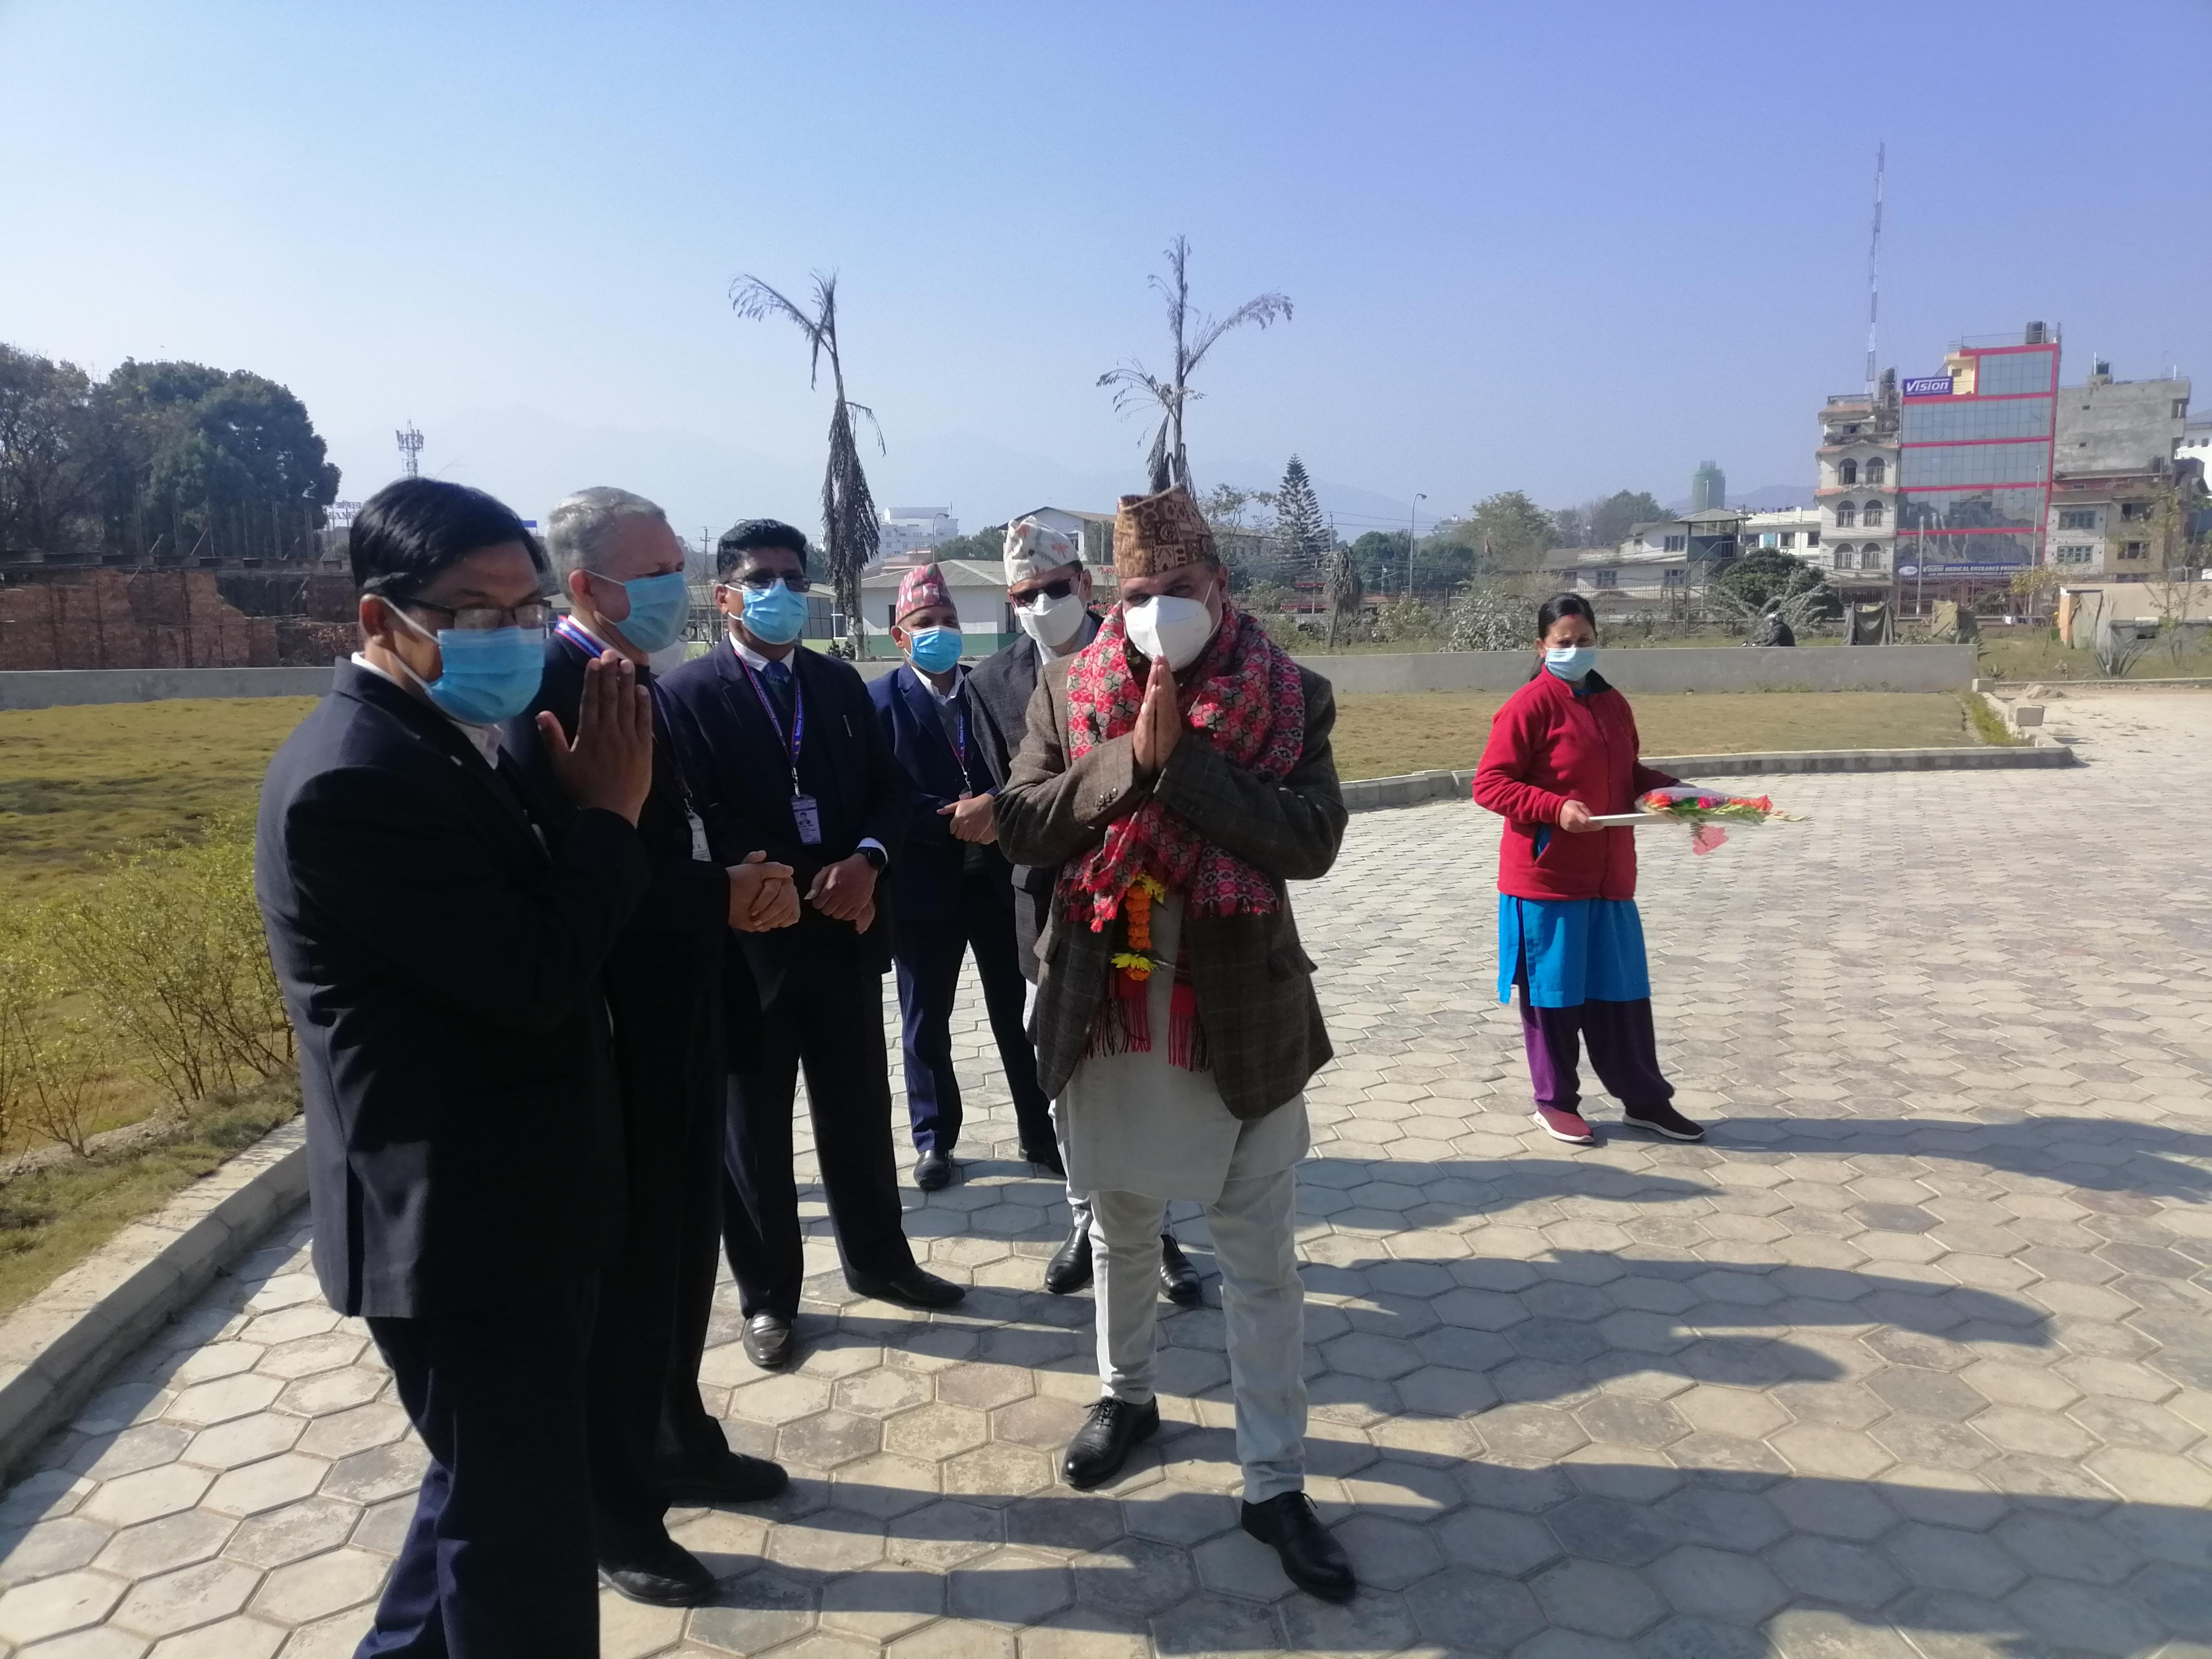 रा . पु . प्रा. का सचिव श्री सुरेश आचार्य ज्यू  लाई स्वागत गर्दै प्राधिकरणका कर्मचारी ।